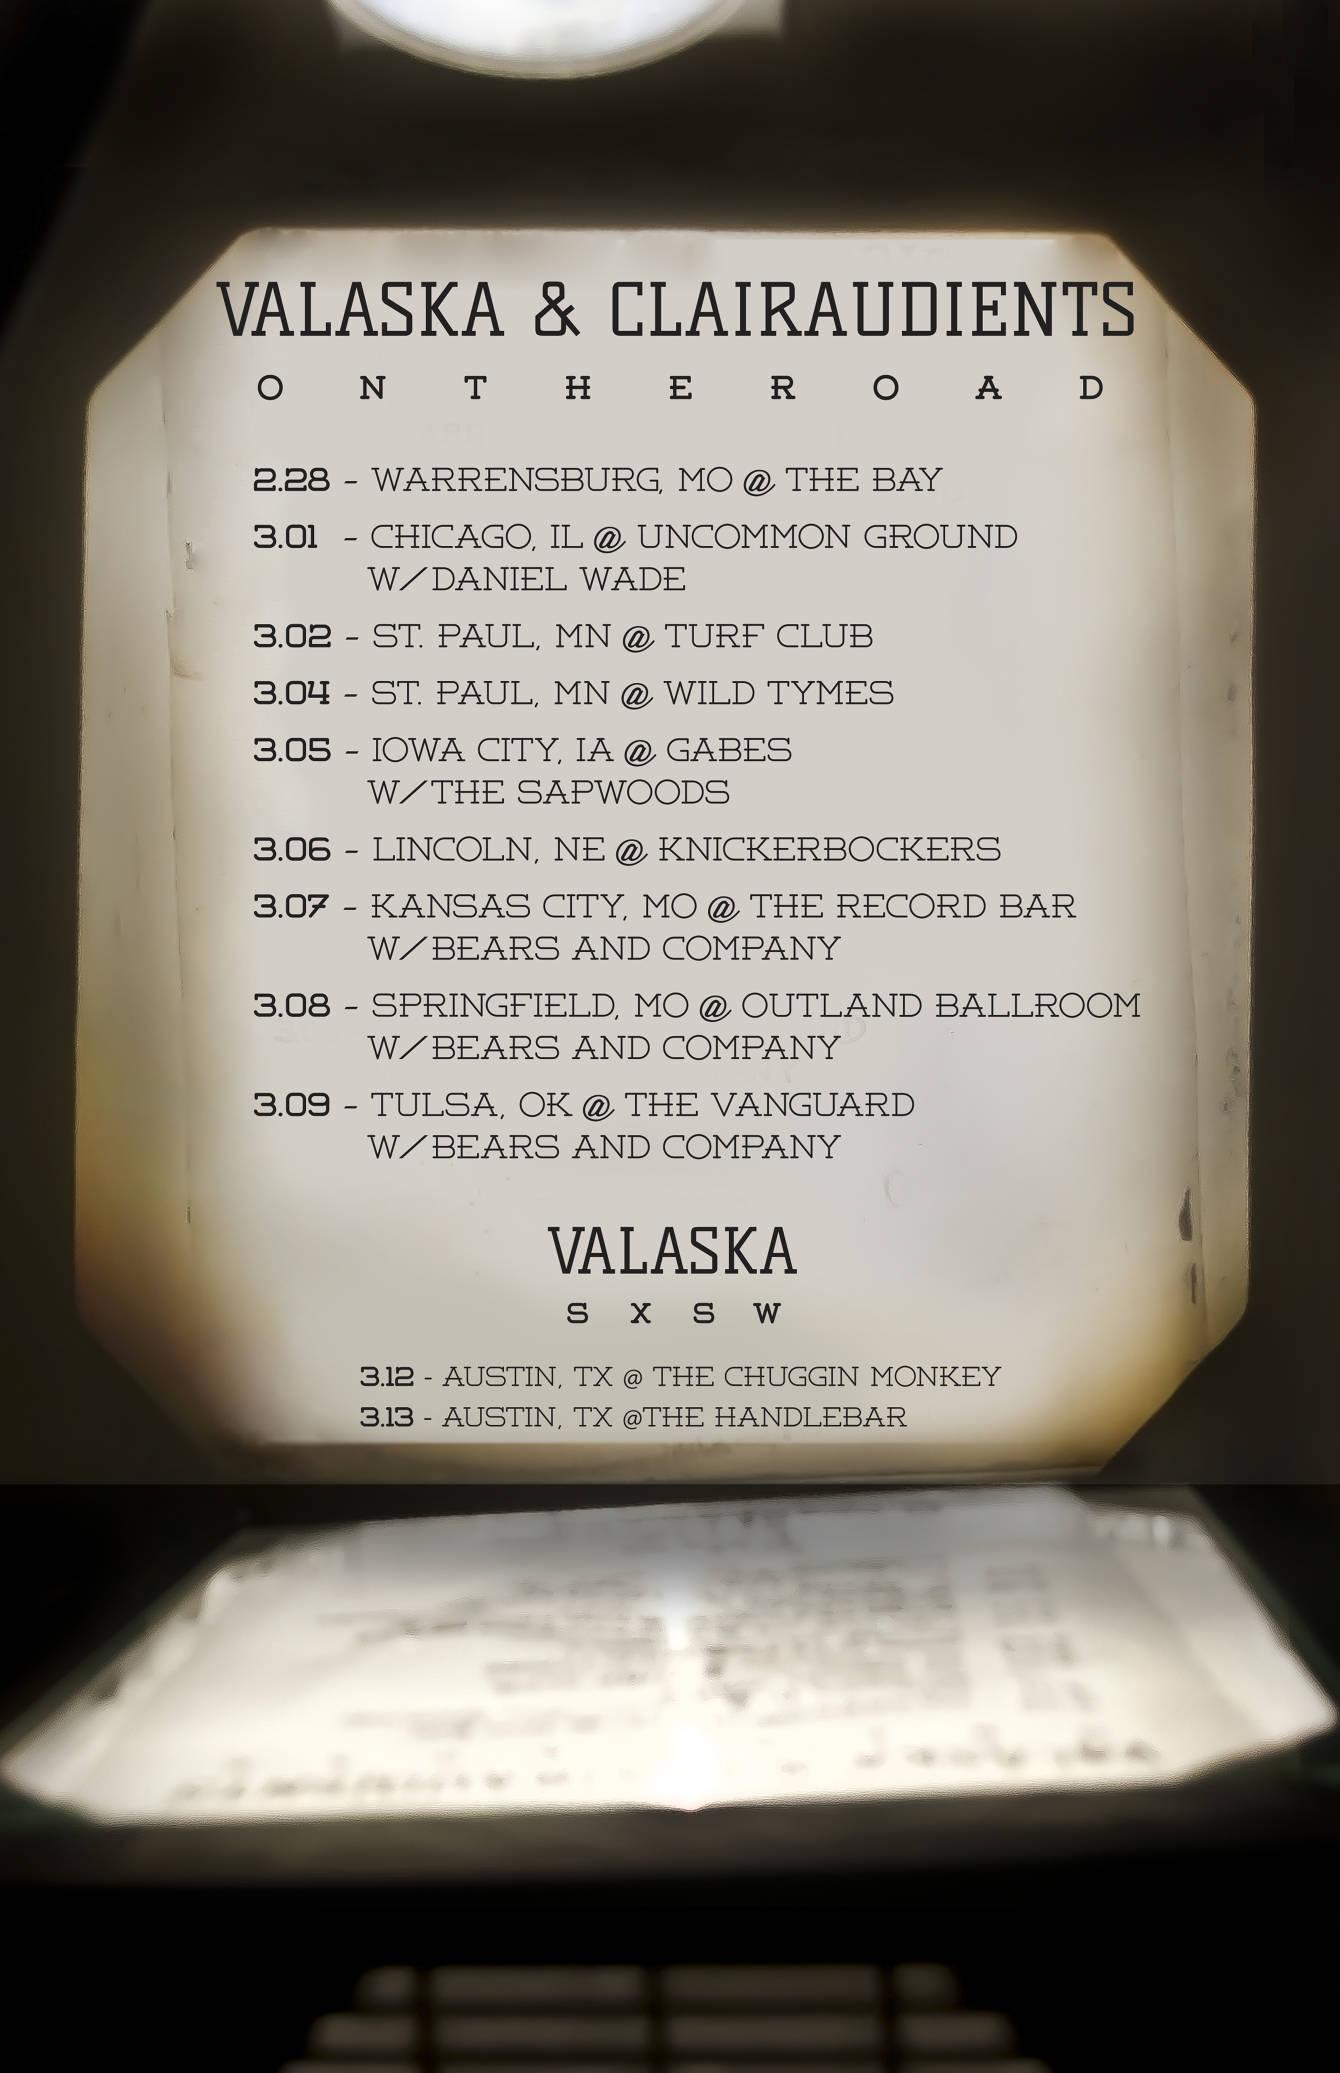 CHRISTINE FIELDER / VALASKA